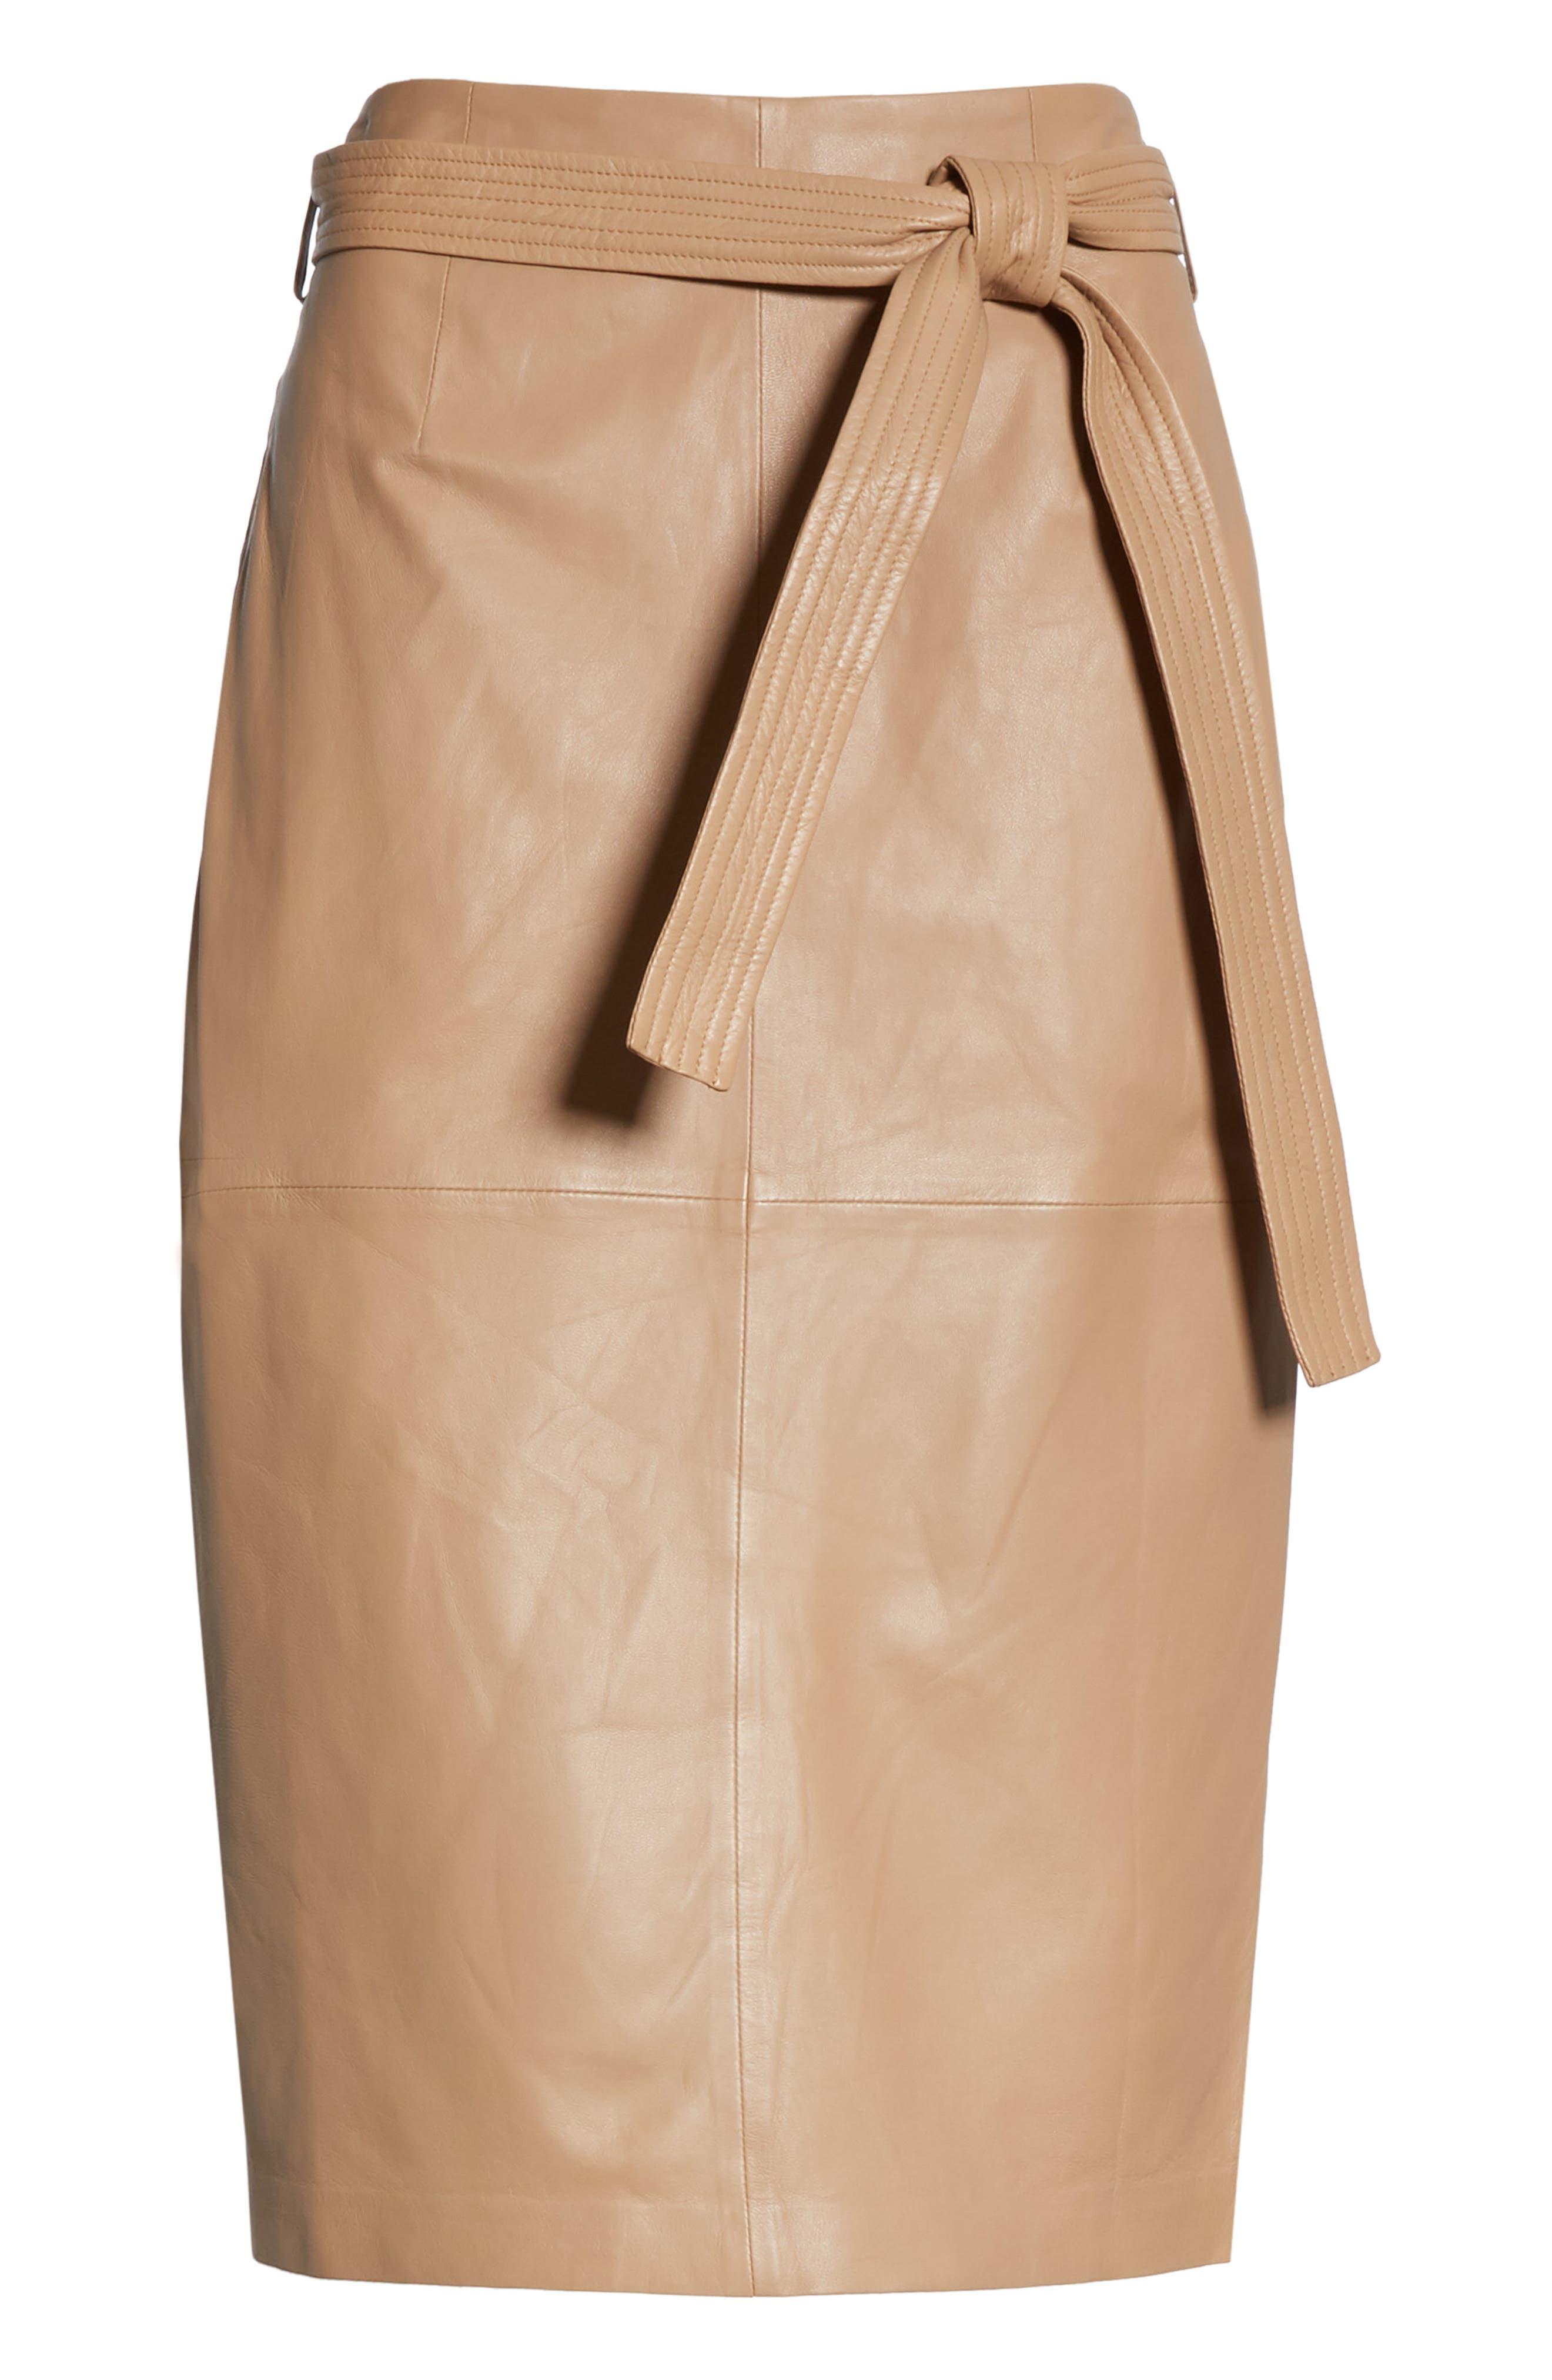 Alouetta Leather Skirt,                             Alternate thumbnail 6, color,                             BOIS